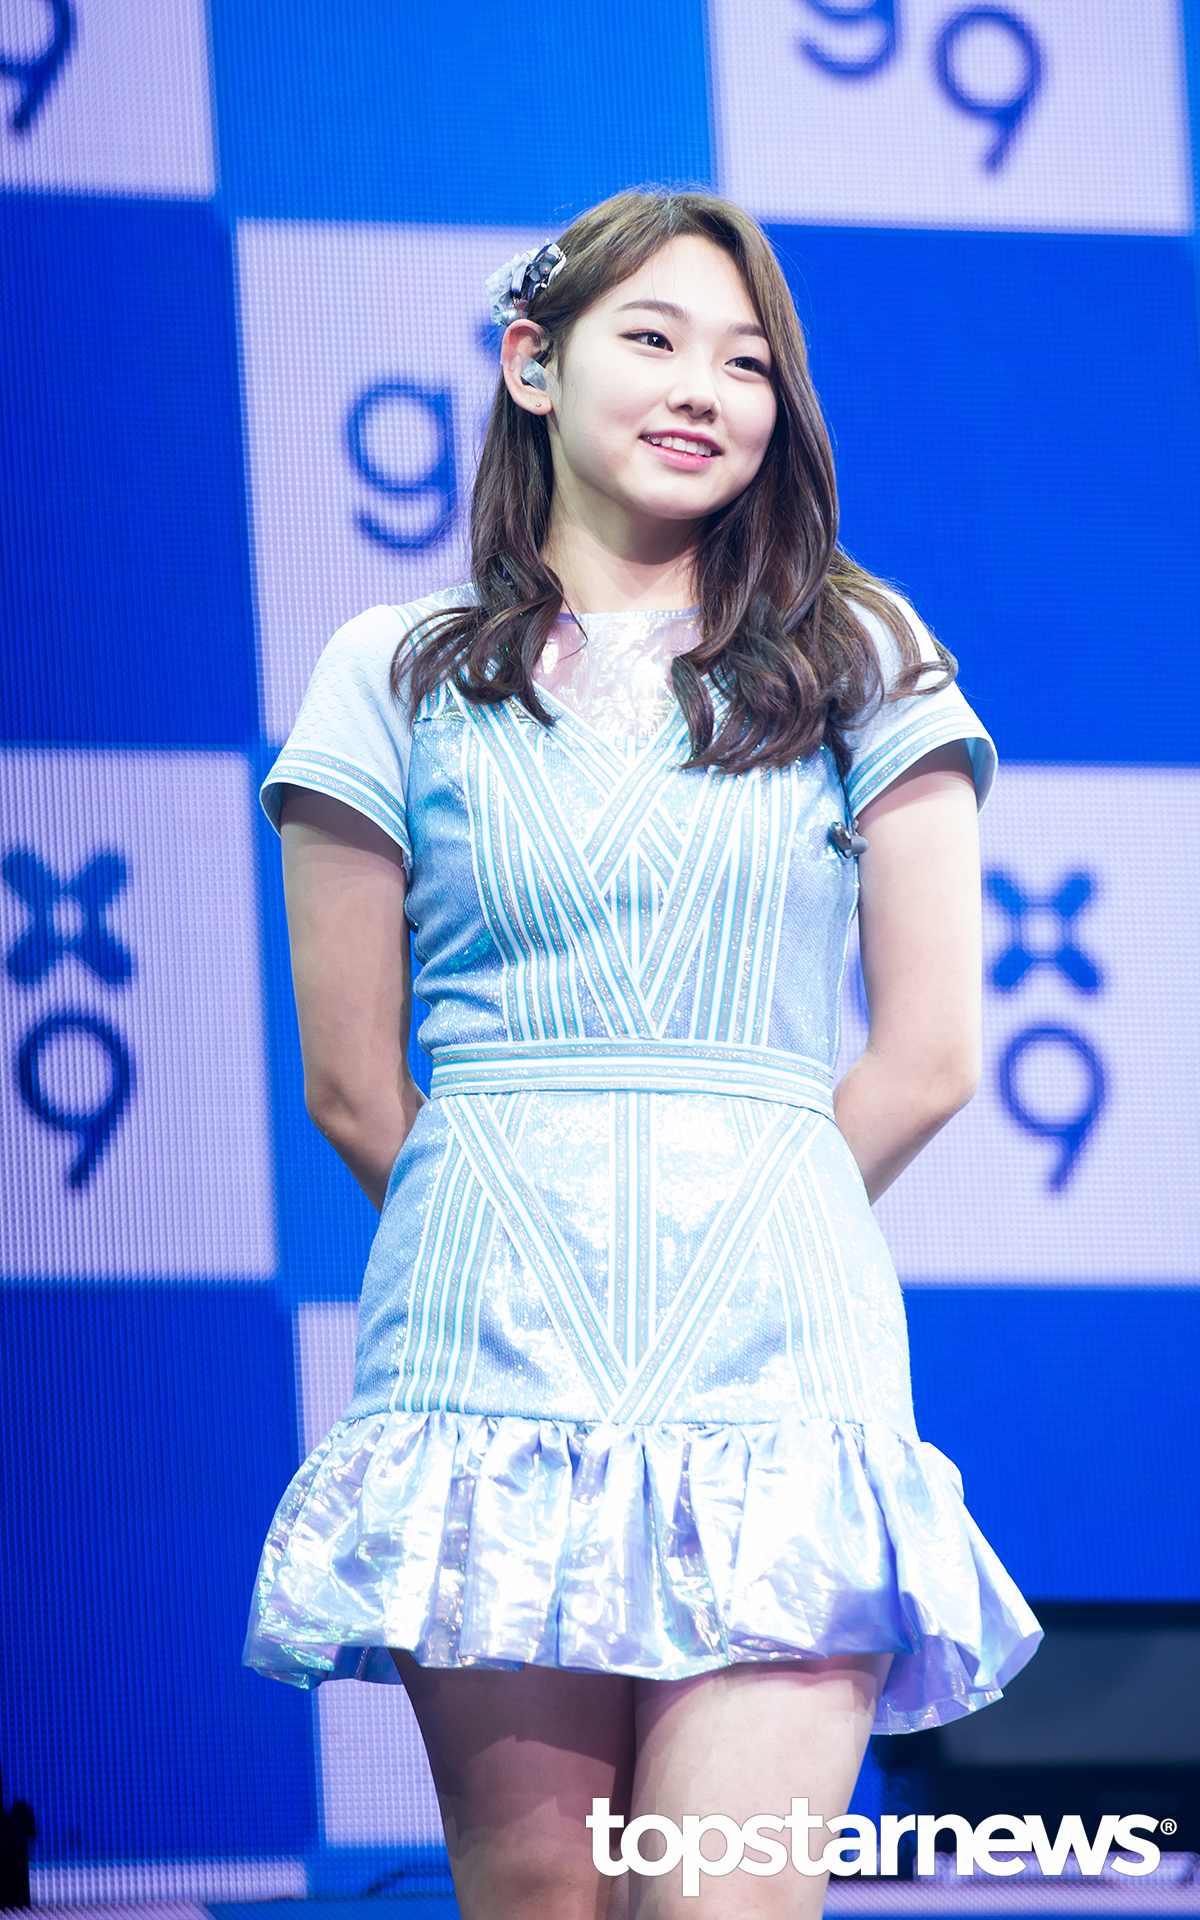 Mina超誠實的說:「第一次聽到的時候嚇了一跳,以為是開玩笑的,但是了解團名的意義之後,9名少女9種魅力感覺很好,覺得是不會讓人忘記的名字。」